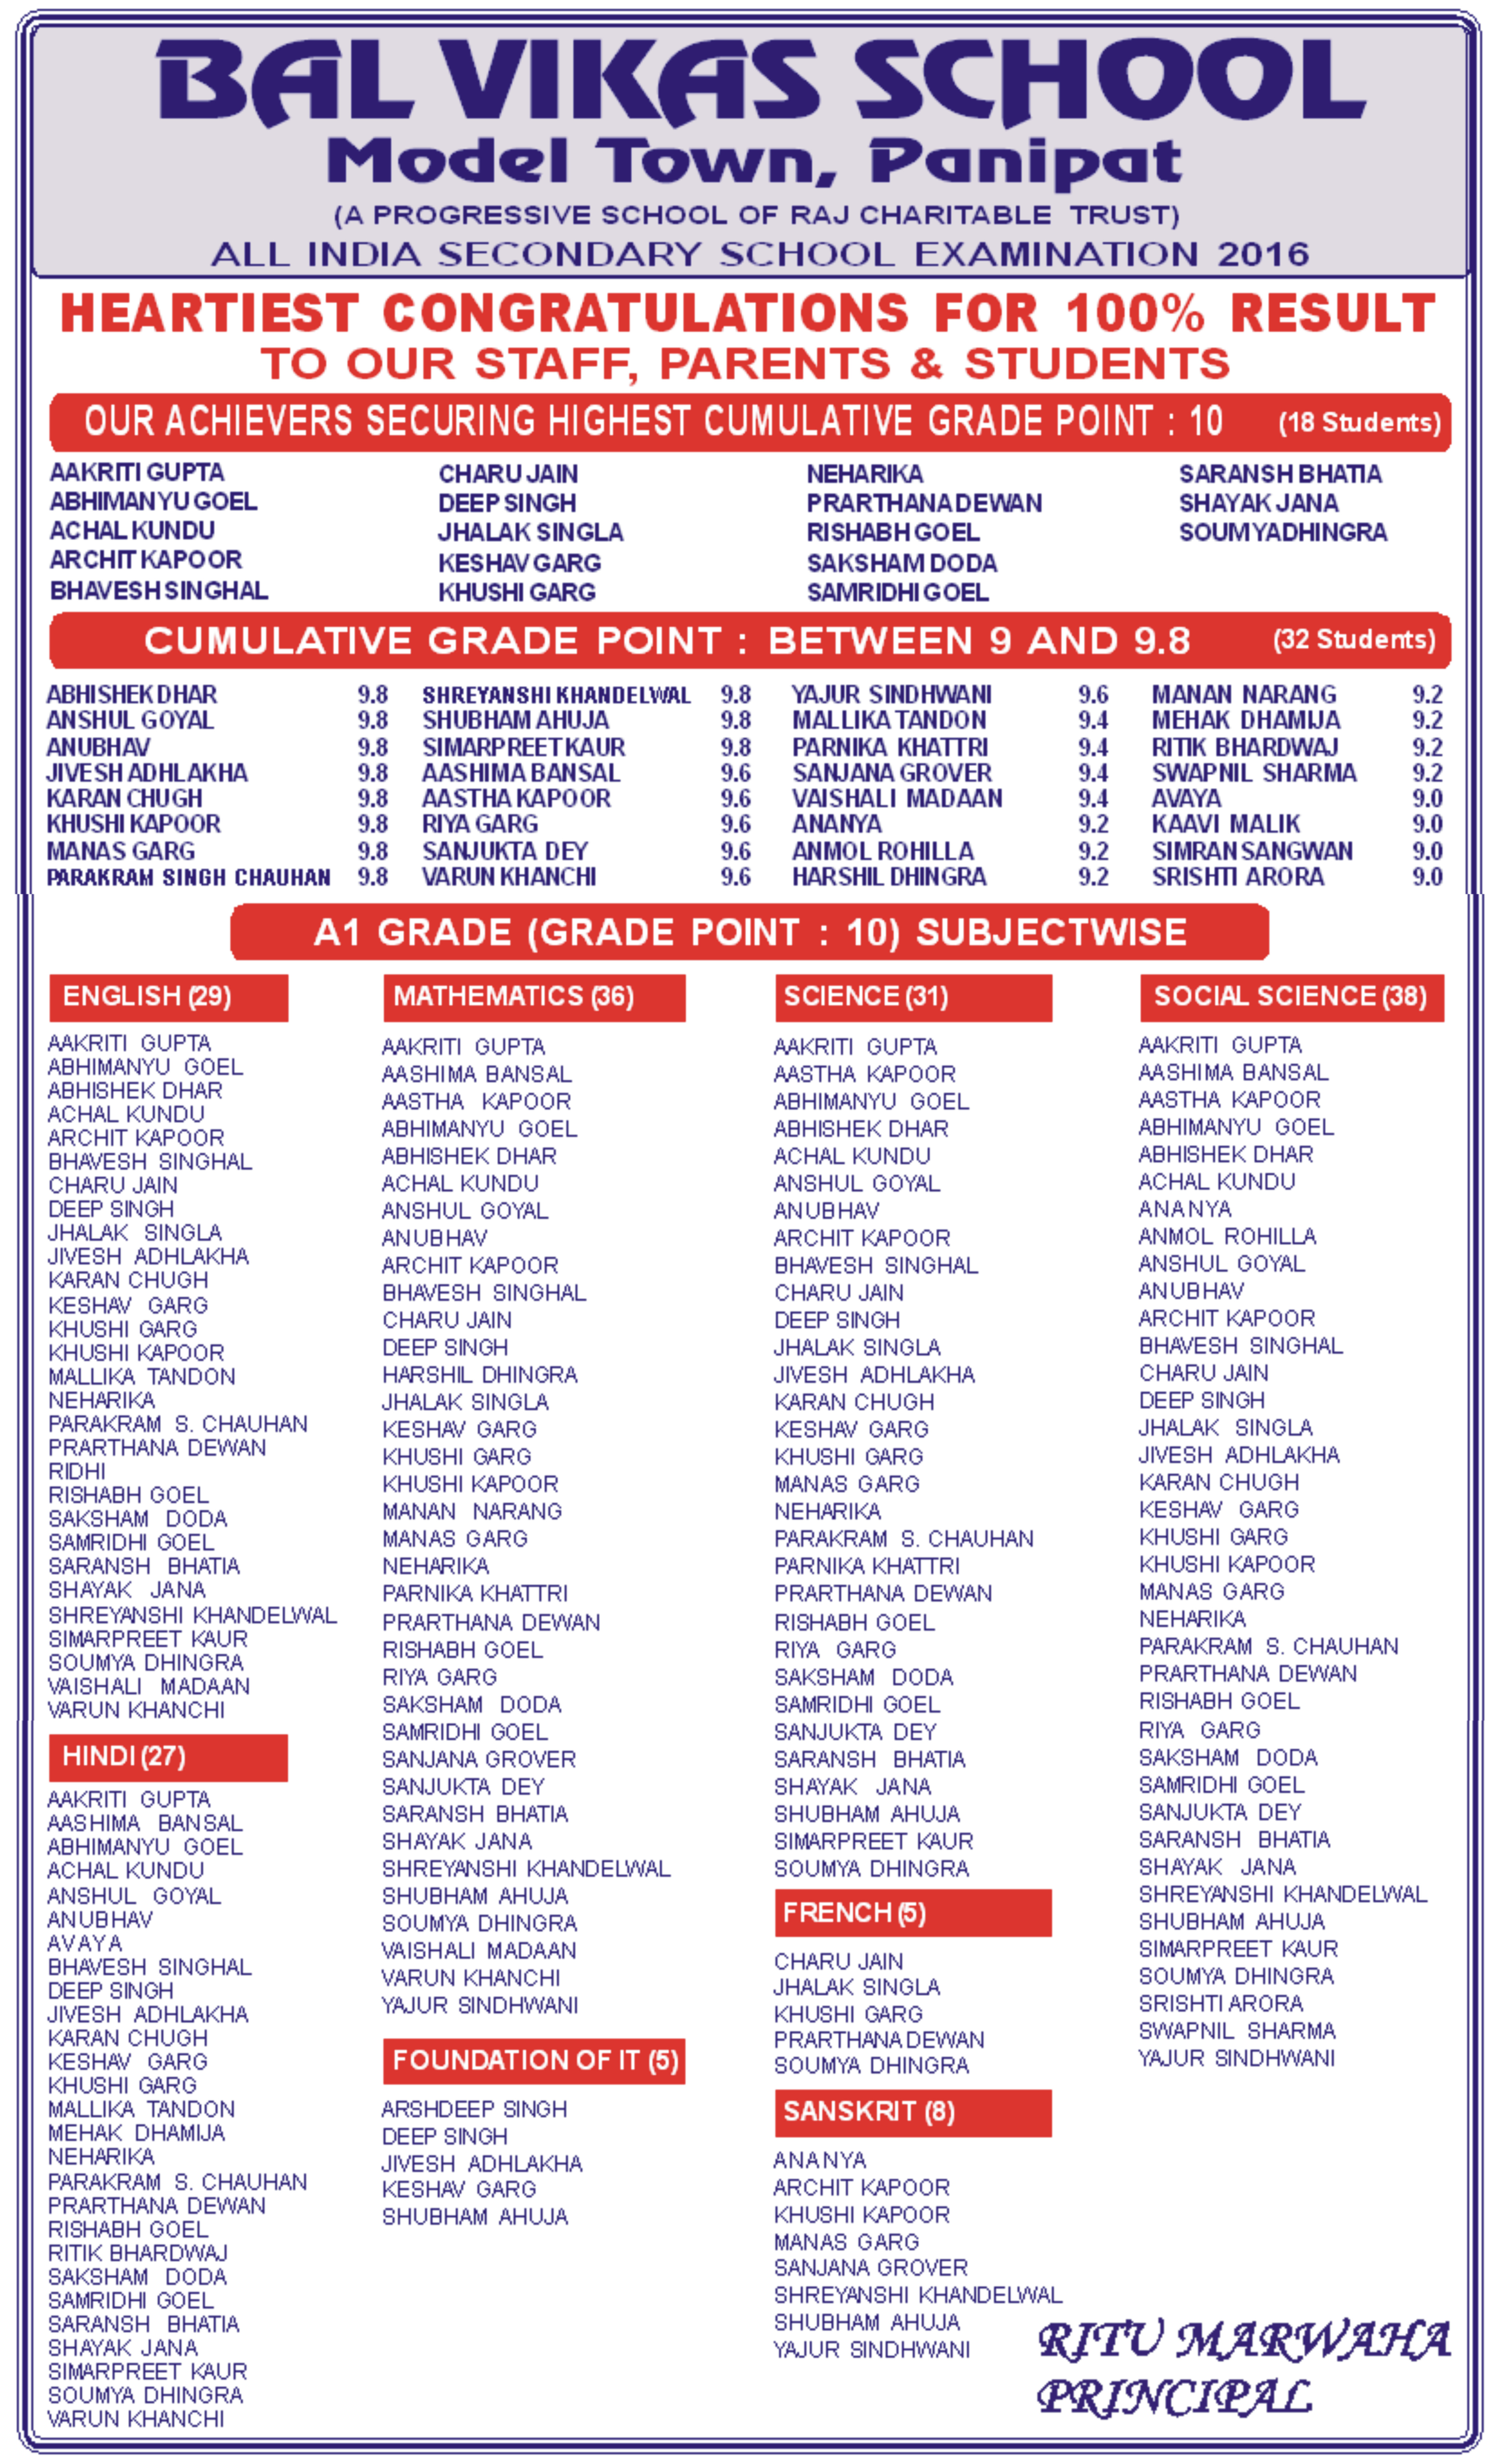 Toppers List 2015-16 | Bal Vikas School Panipat